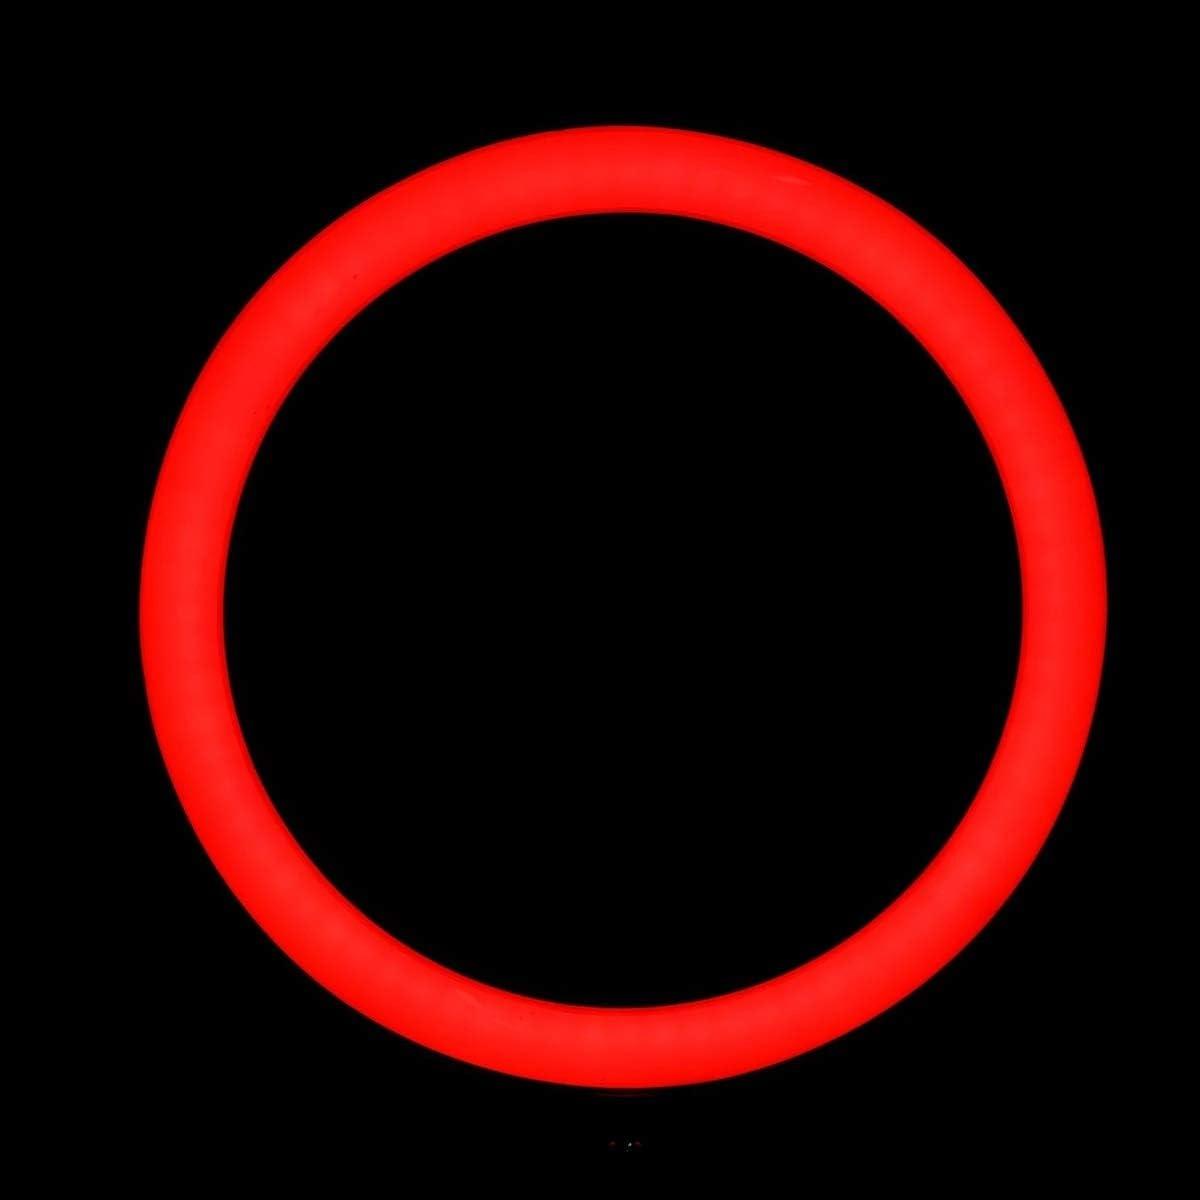 WUSHIYU Ring Light 6500K Dimmable Selfie Photo Lamp LED Ring Light Phone Holder for Make Up Live Studio 13 Inch Camera Photo Video Lighting Color : White, Size : 13inch